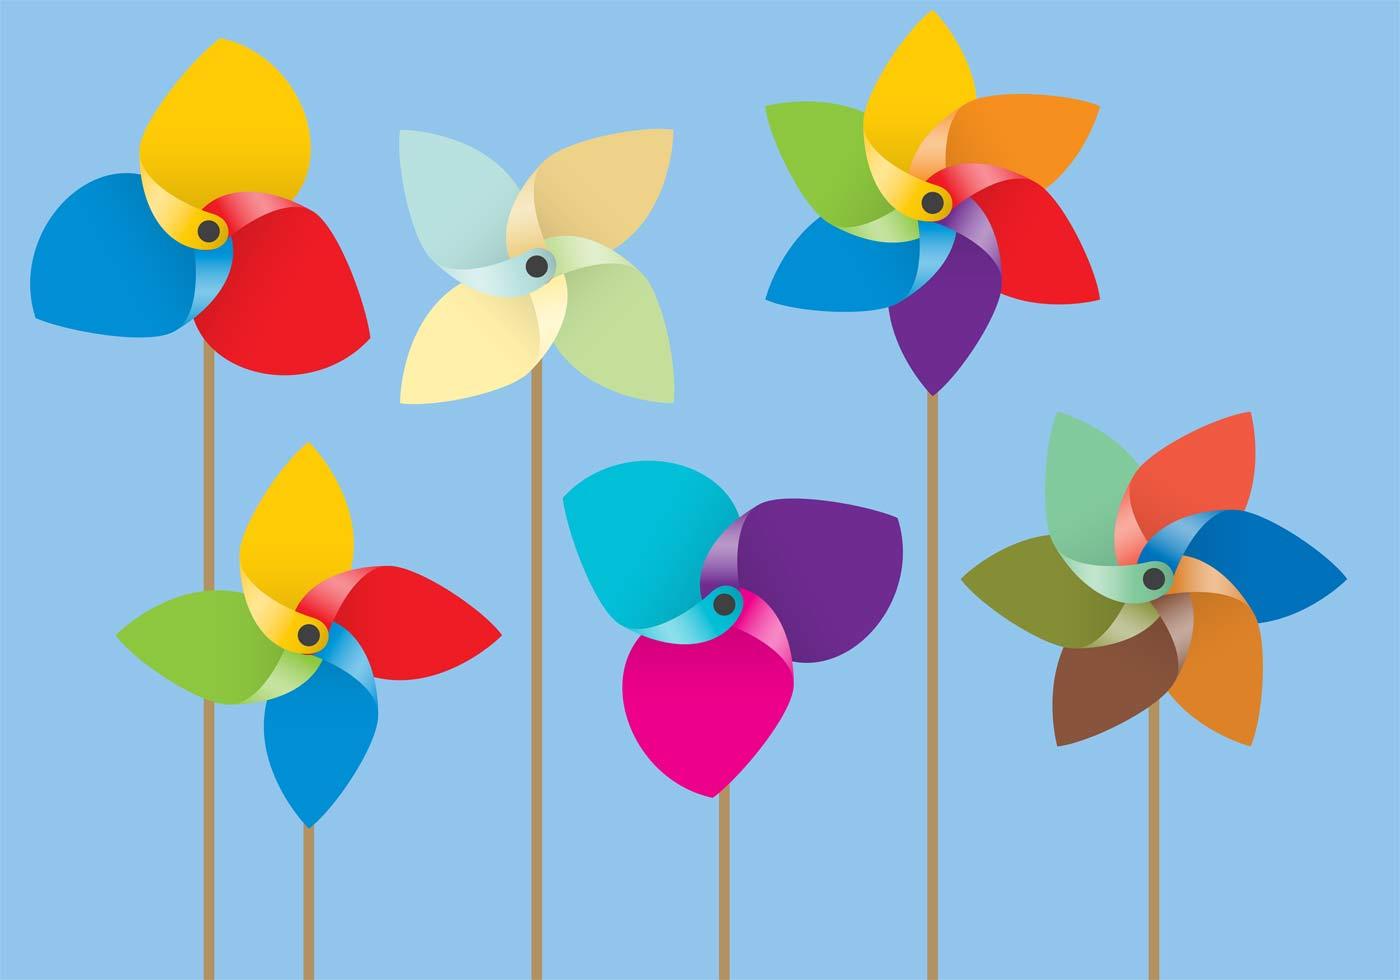 Colorful Paper Windmill Vectors - Download Free Vector Art ...